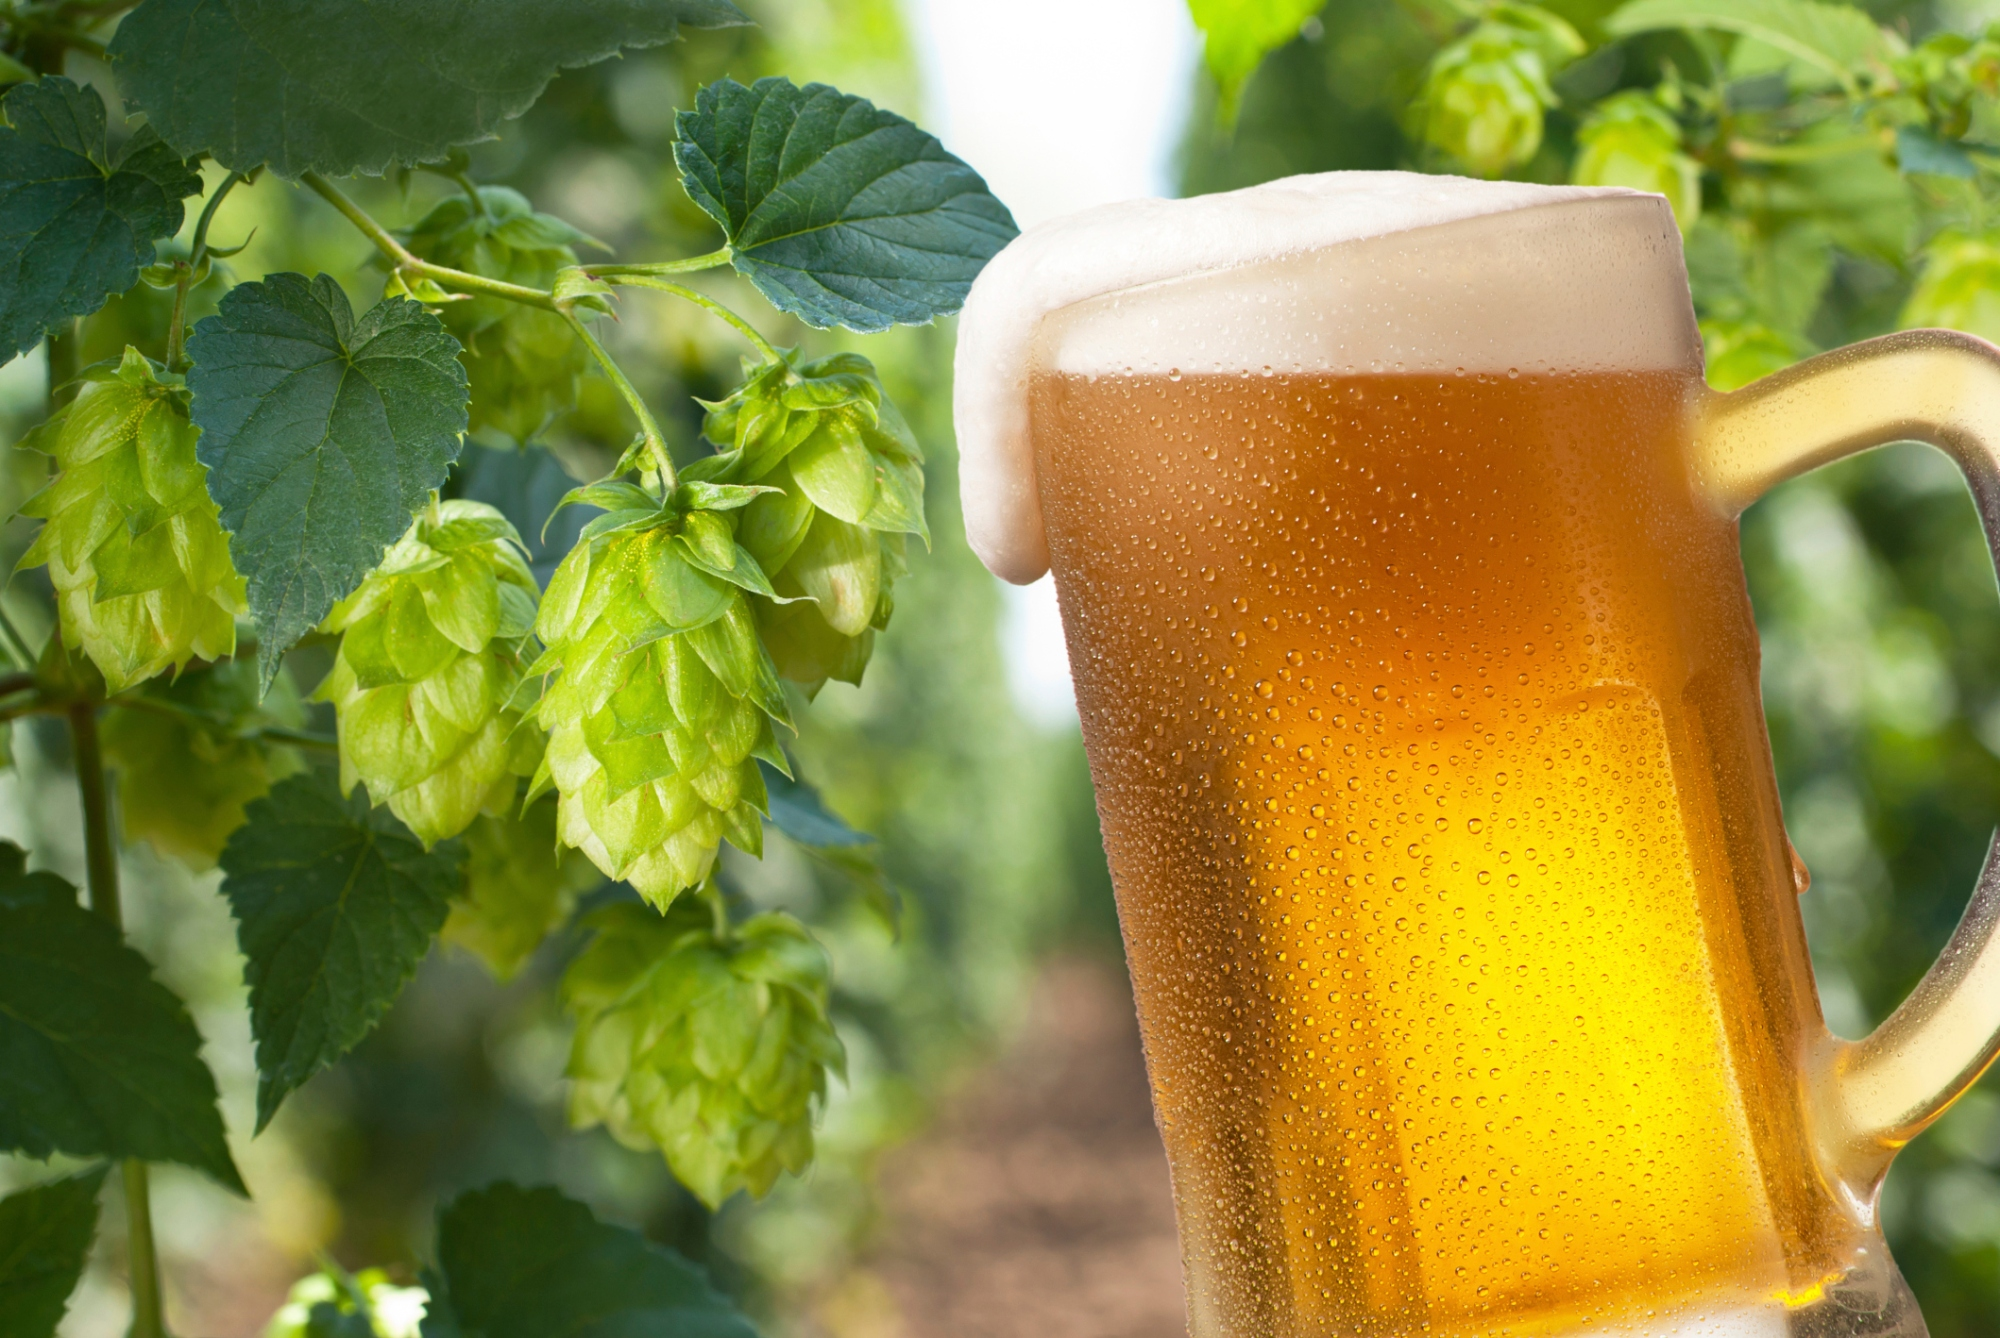 xanthohumol hops beer diabetes obesity hypertension cancer